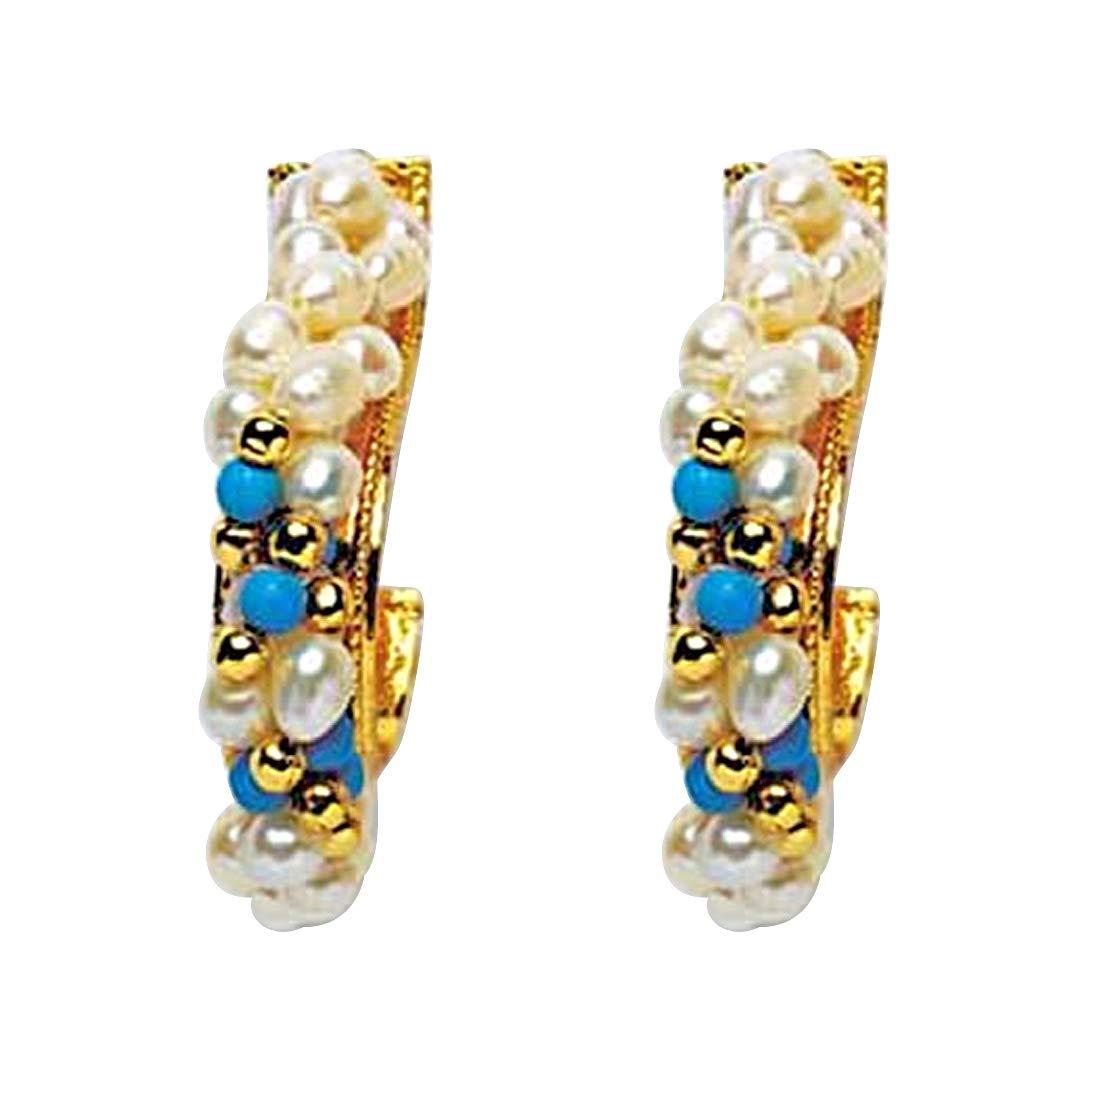 Rapturous Ravishing - Real Rice Pearl & Turquoise Beads Bali Style Earring for Women (SE15)